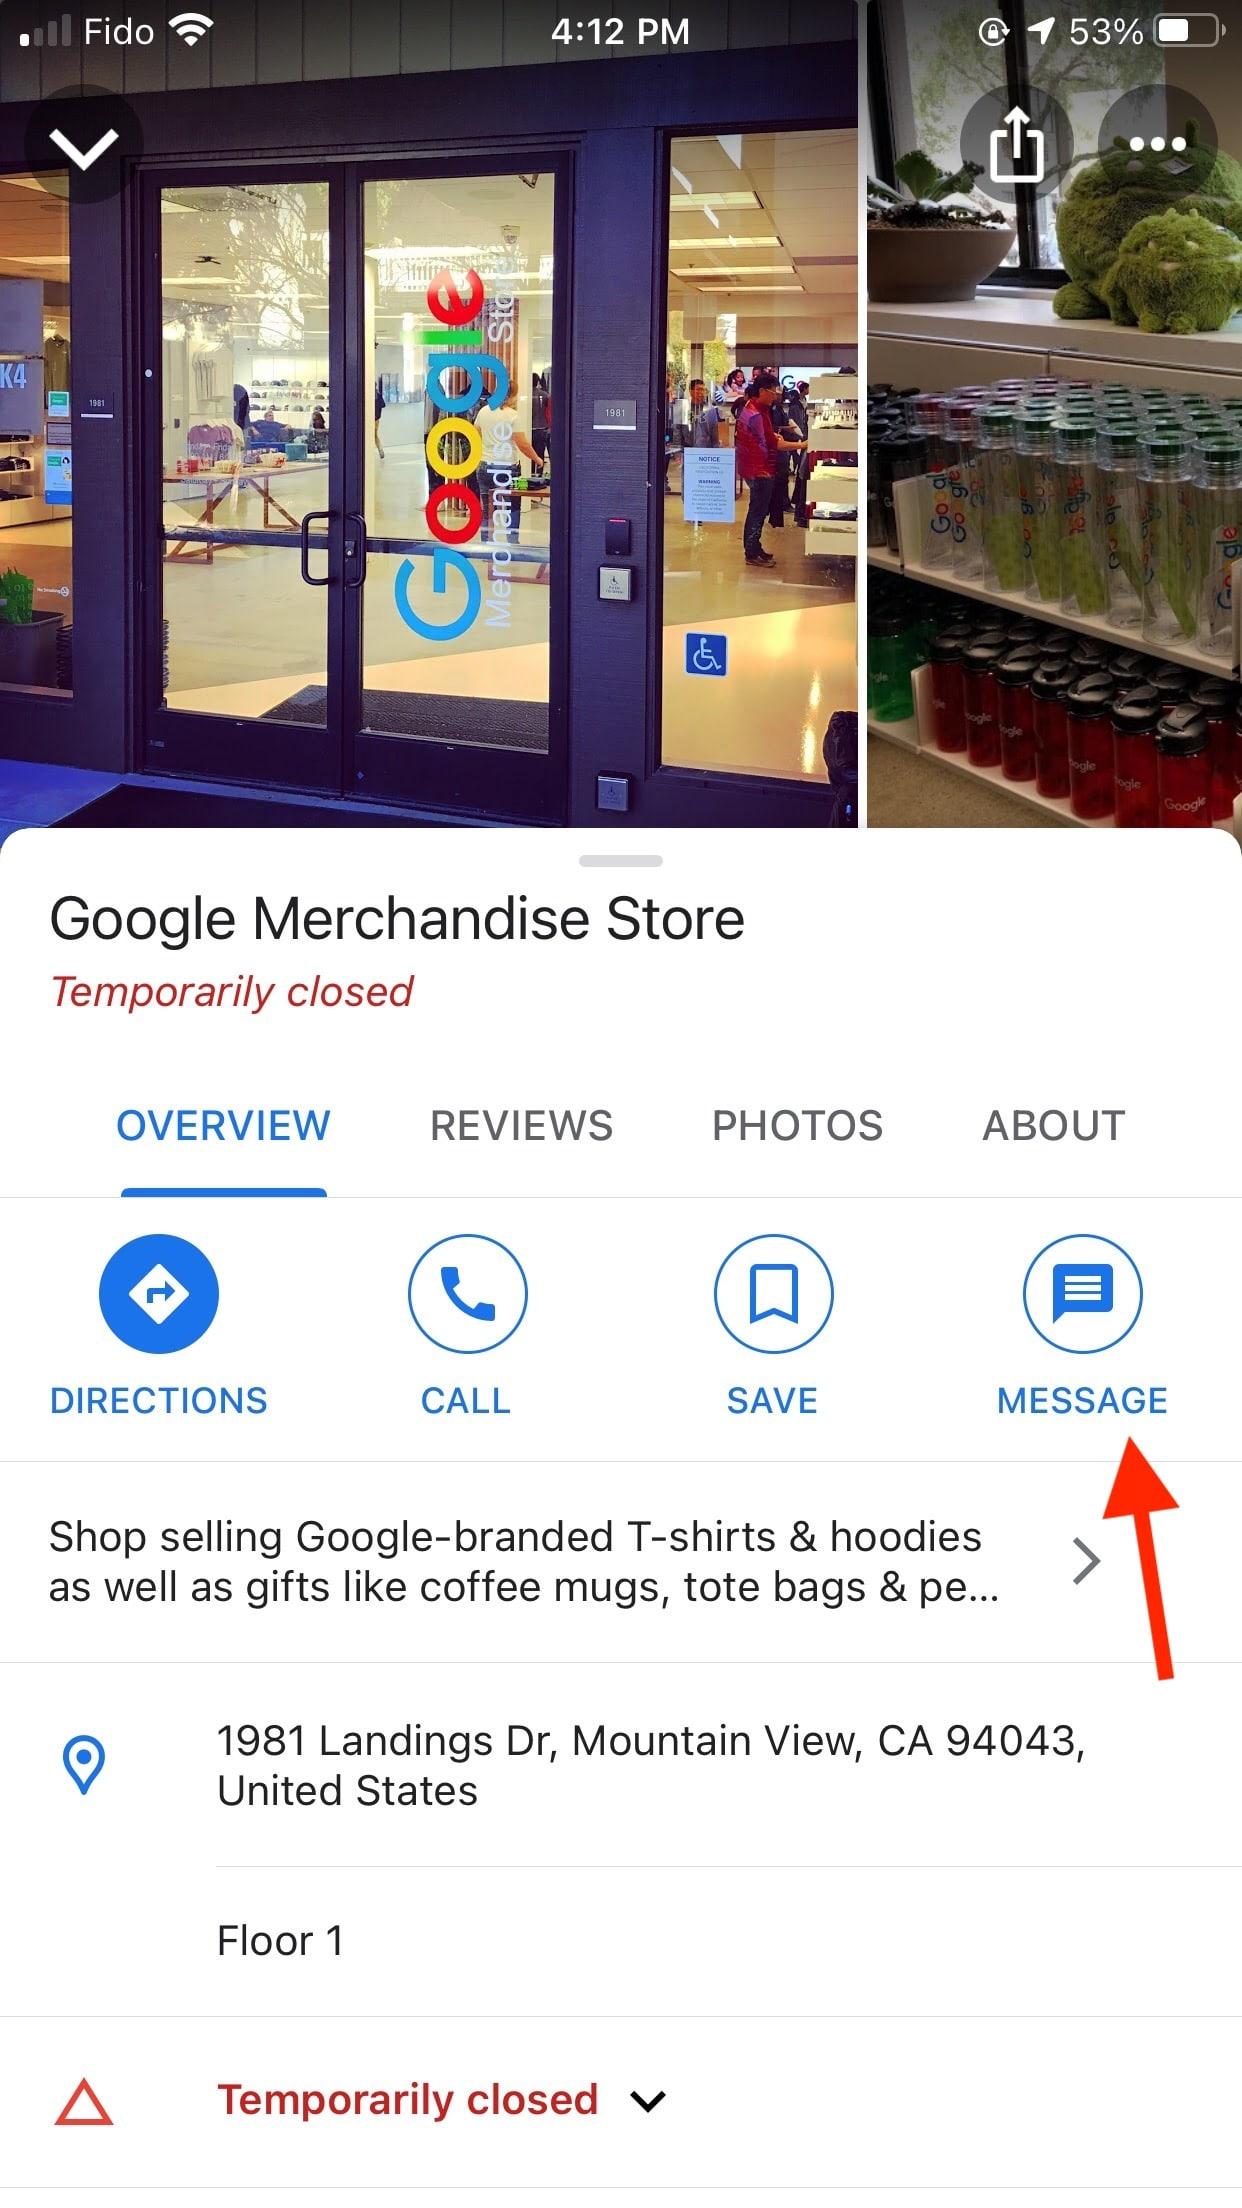 Google Merchandise Store message button